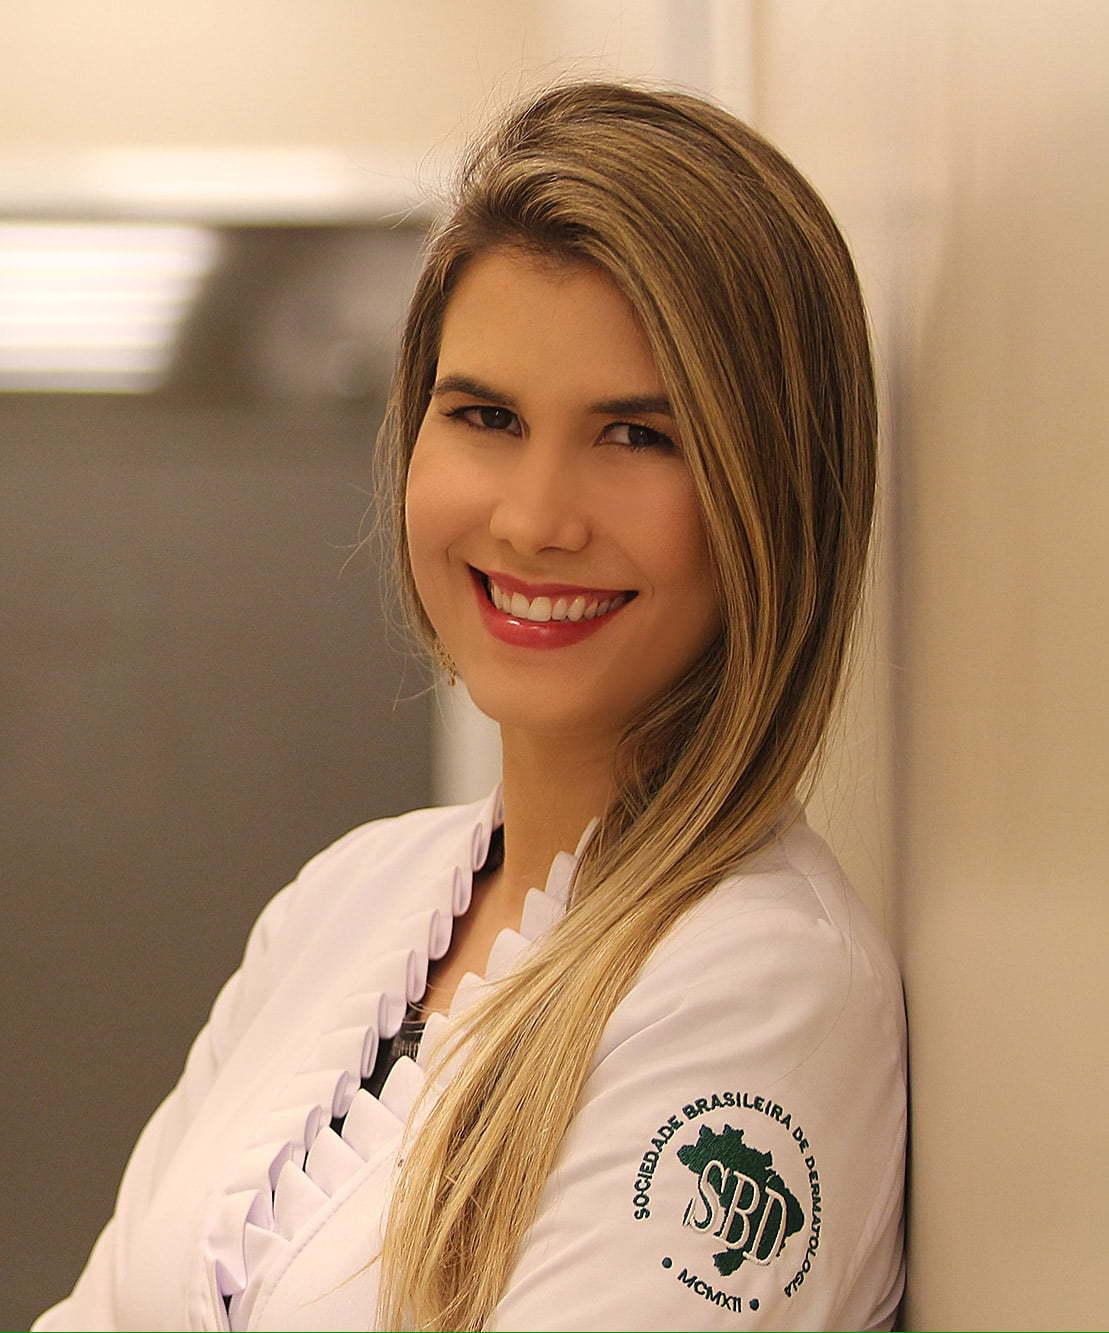 Dra. Aline Palitot Santana